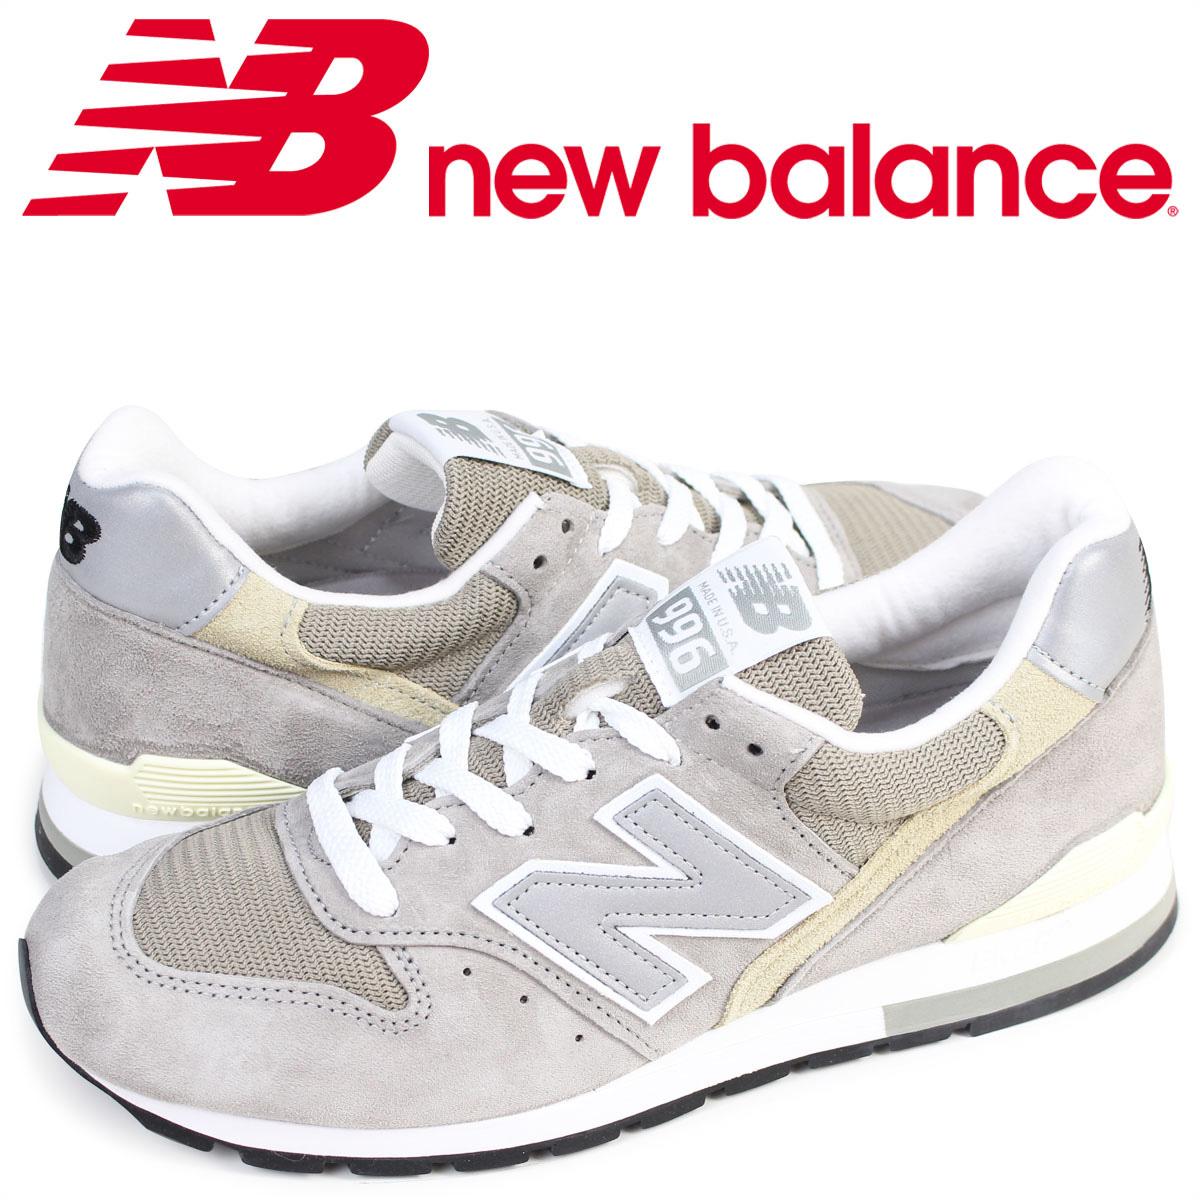 new balance M996 GY ニューバランス 996 スニーカー MADE IN USA Dワイズ メンズ 靴 グレー [4/2 再入荷]